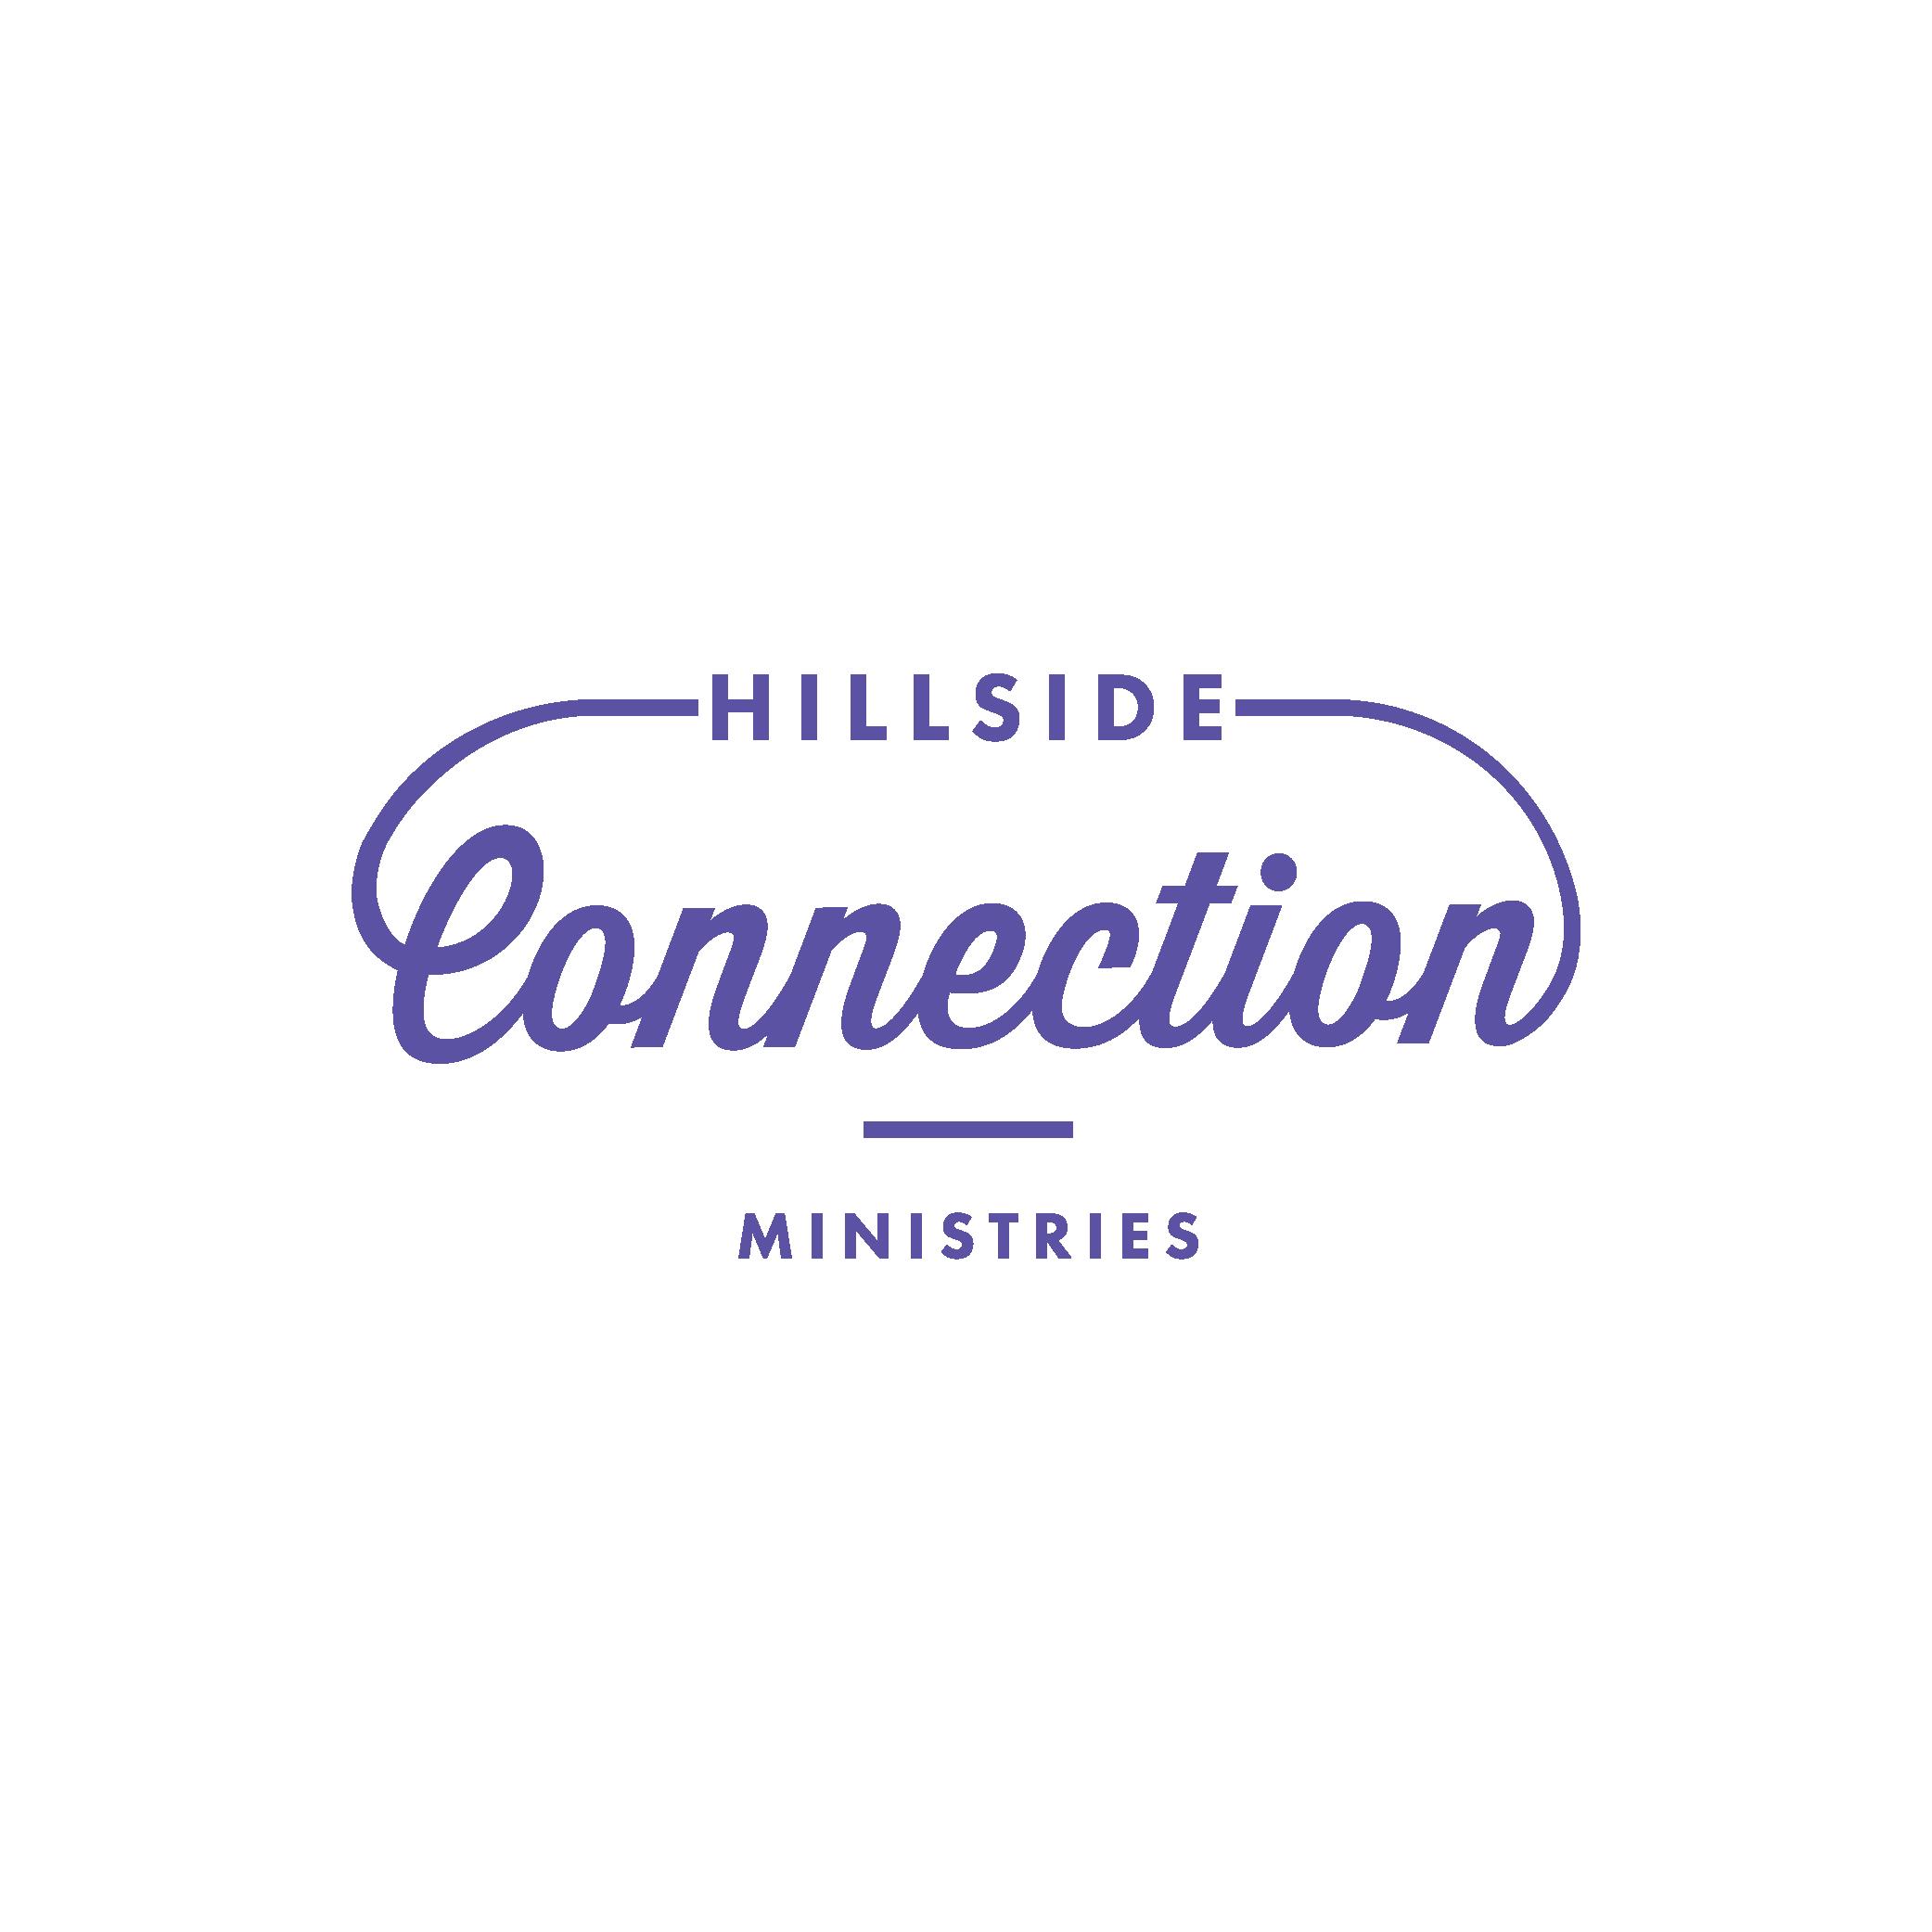 150917 Hillside Connections Logo 2.0-18.png